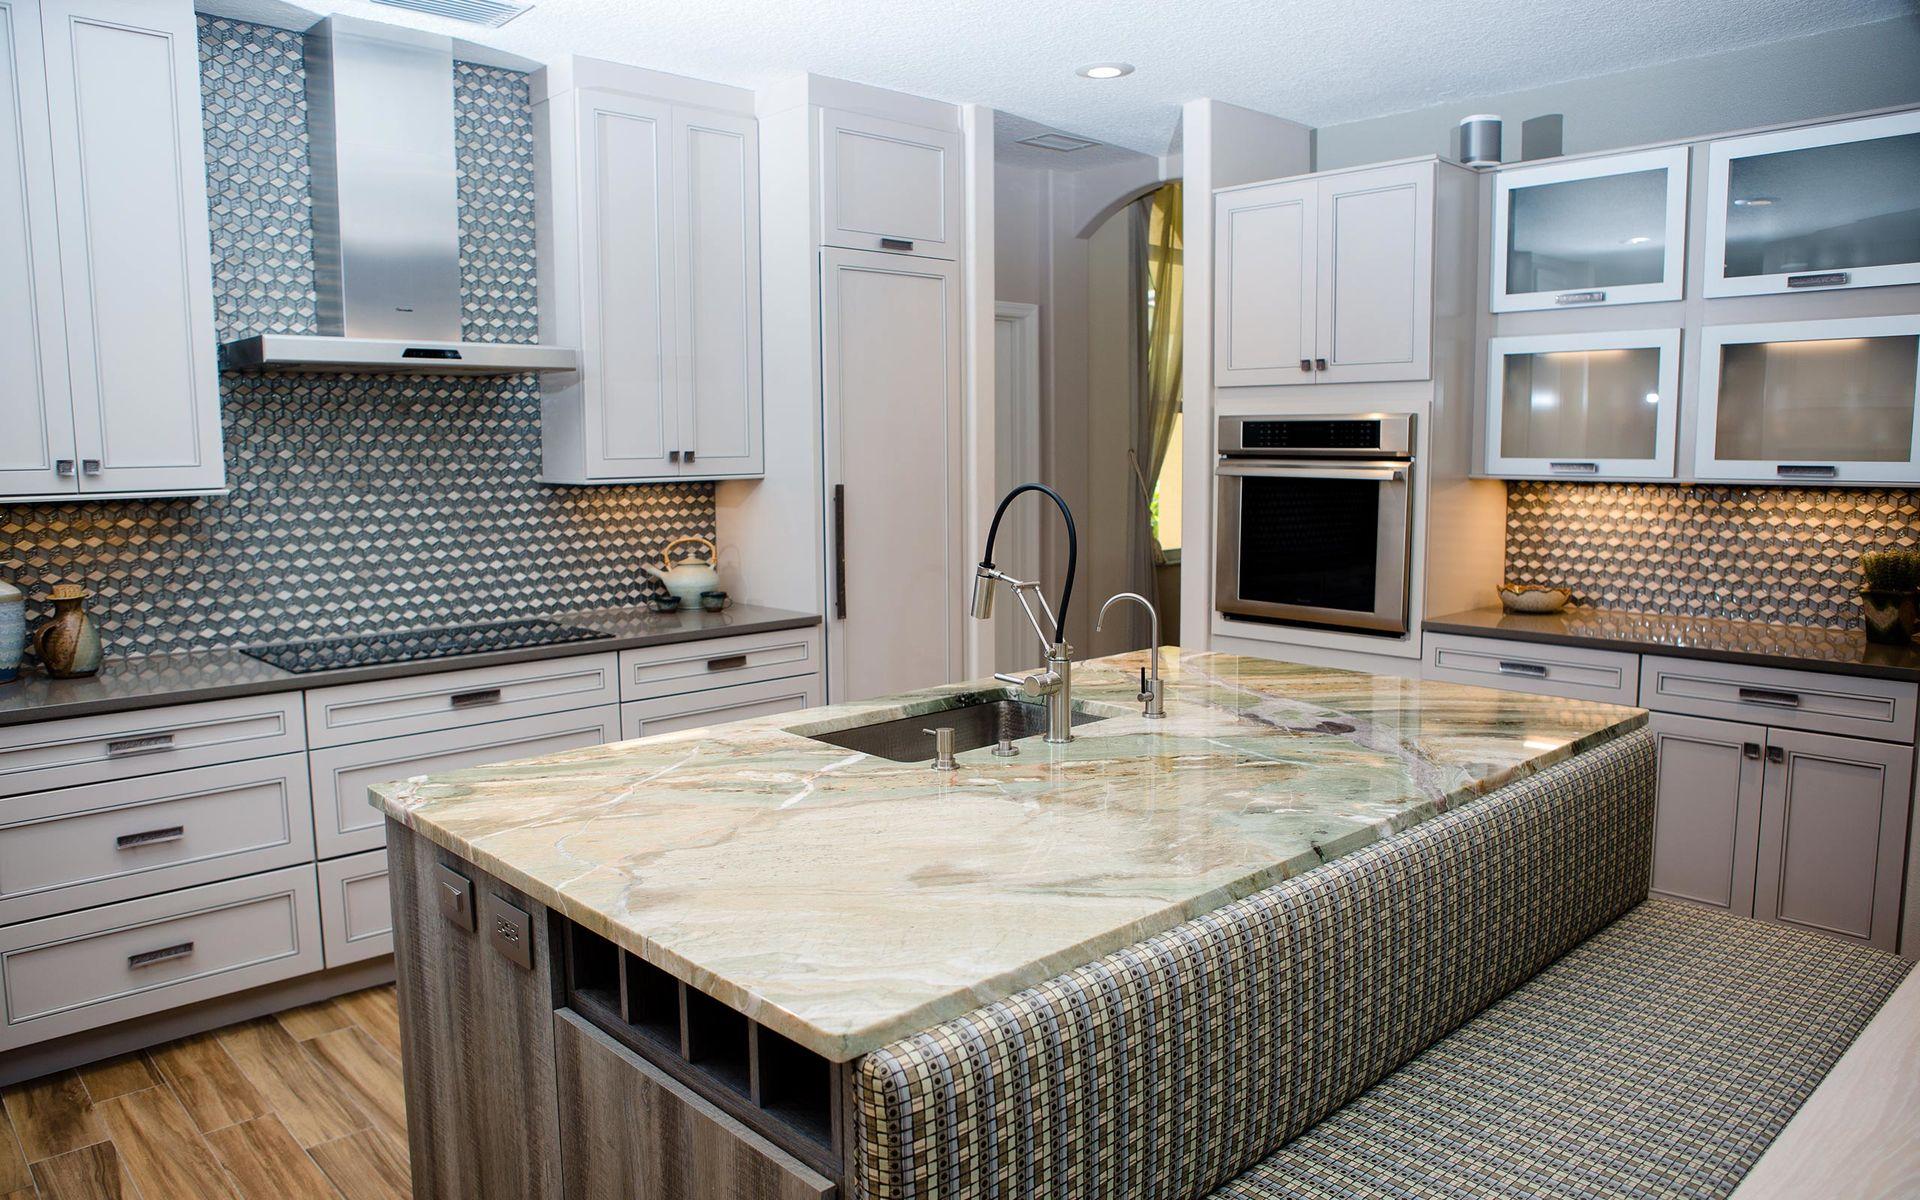 corian quartz and granite kitchen solid surface gettyimages comparison countertop